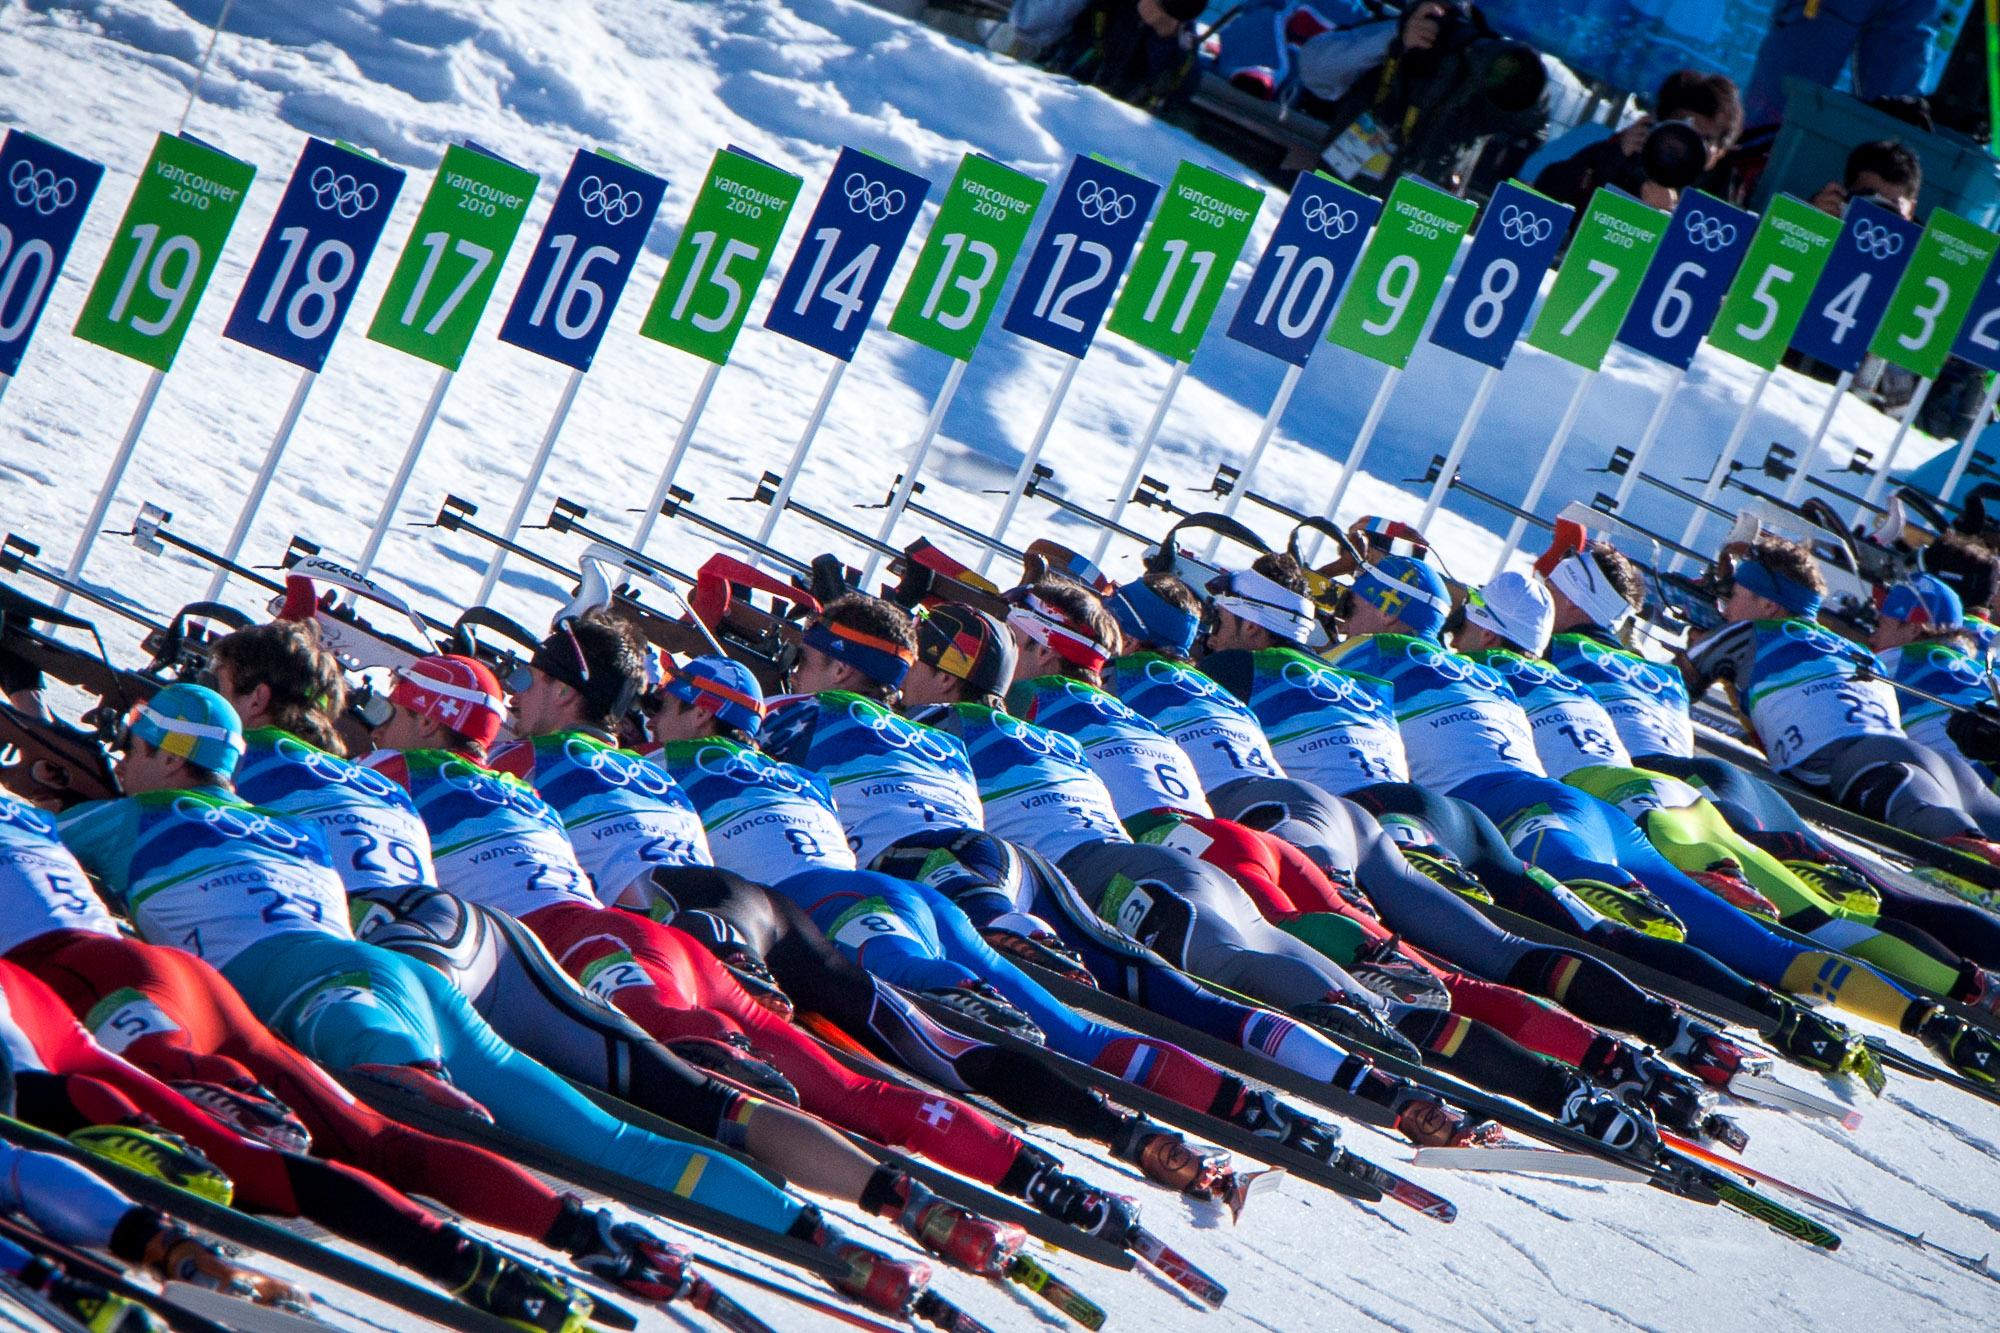 Justa-Jeskova-sport-events-photography-JJ006732.jpg